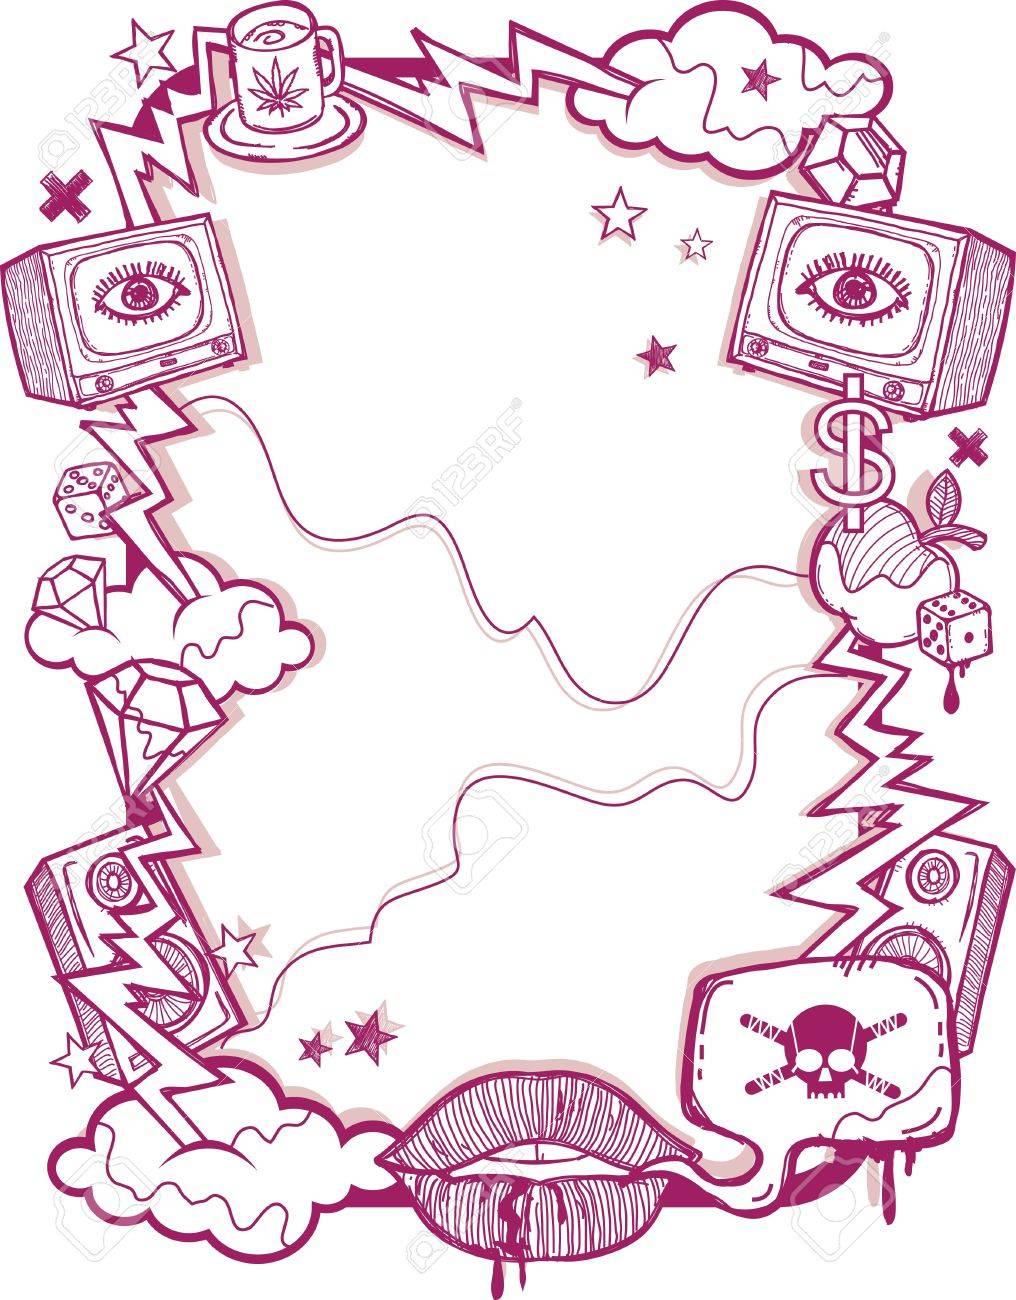 Grunge Poster Stock Vector - 11152753